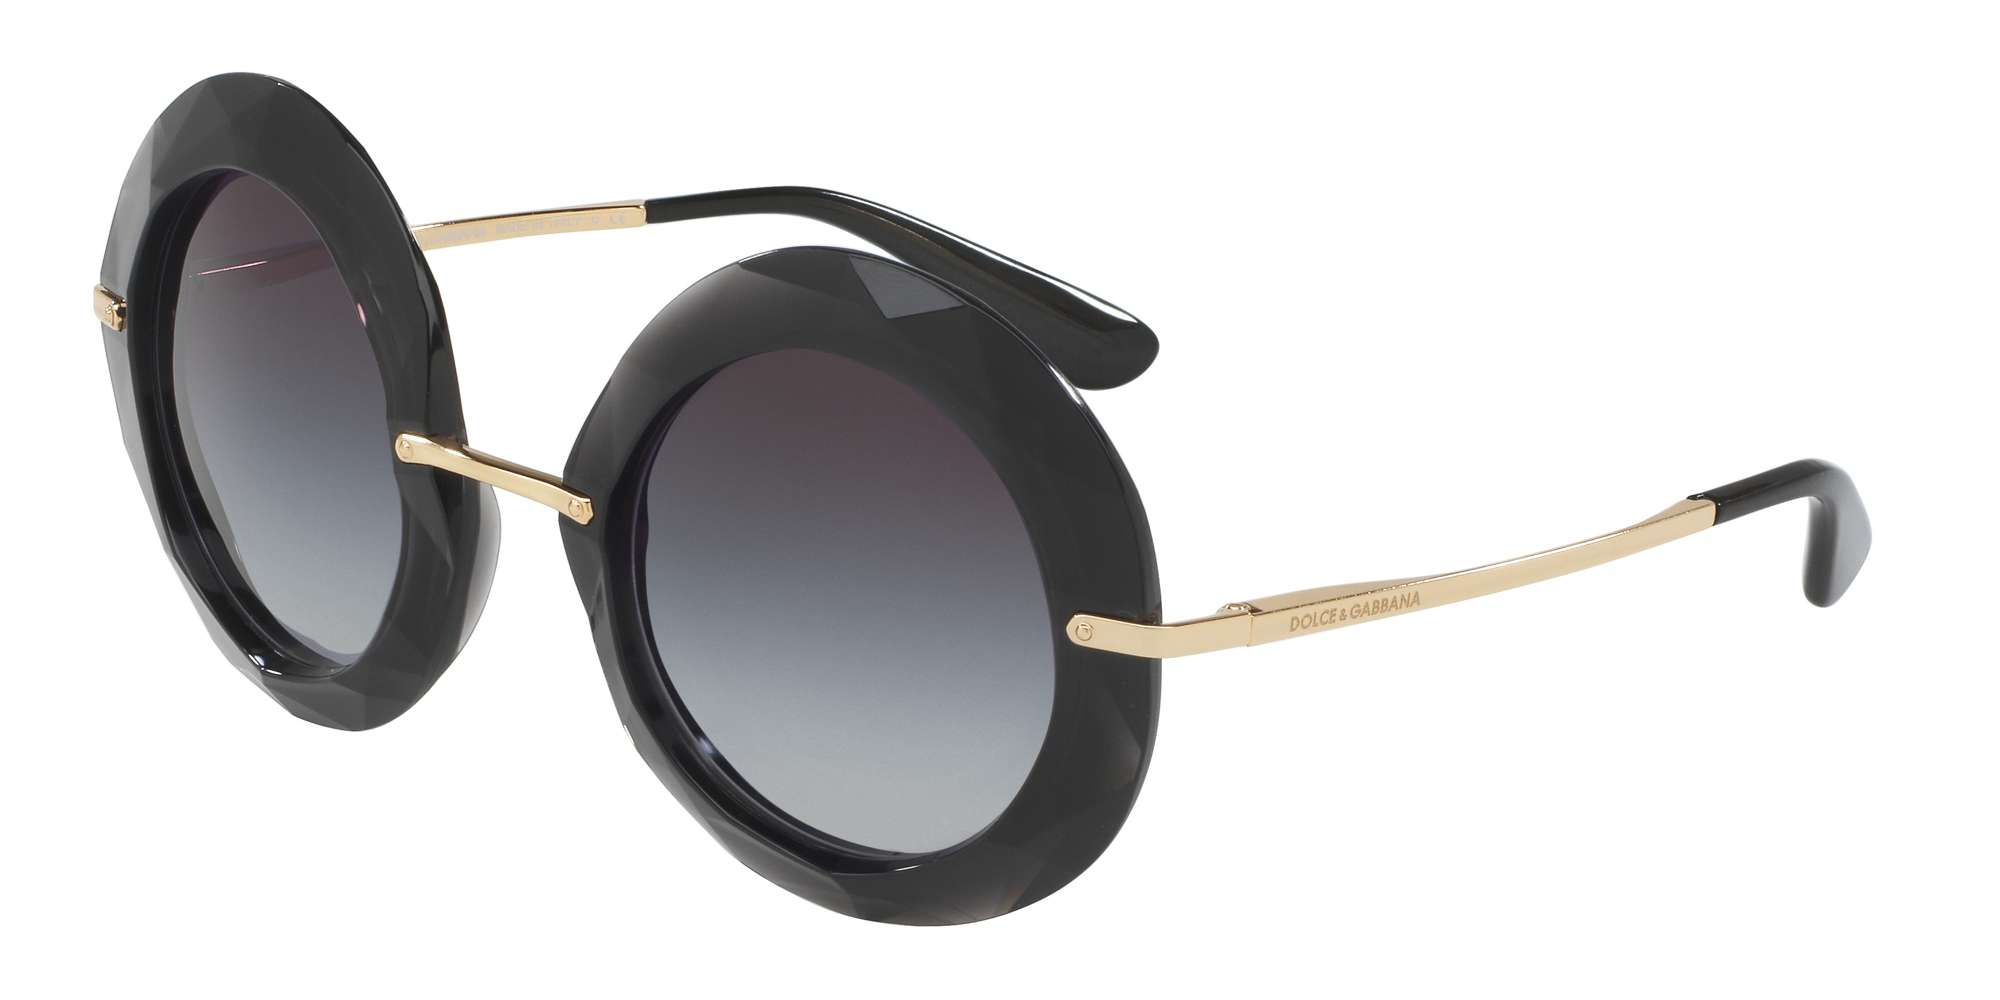 TRANSPARENT GRAY / GREY GRADIENT lenses